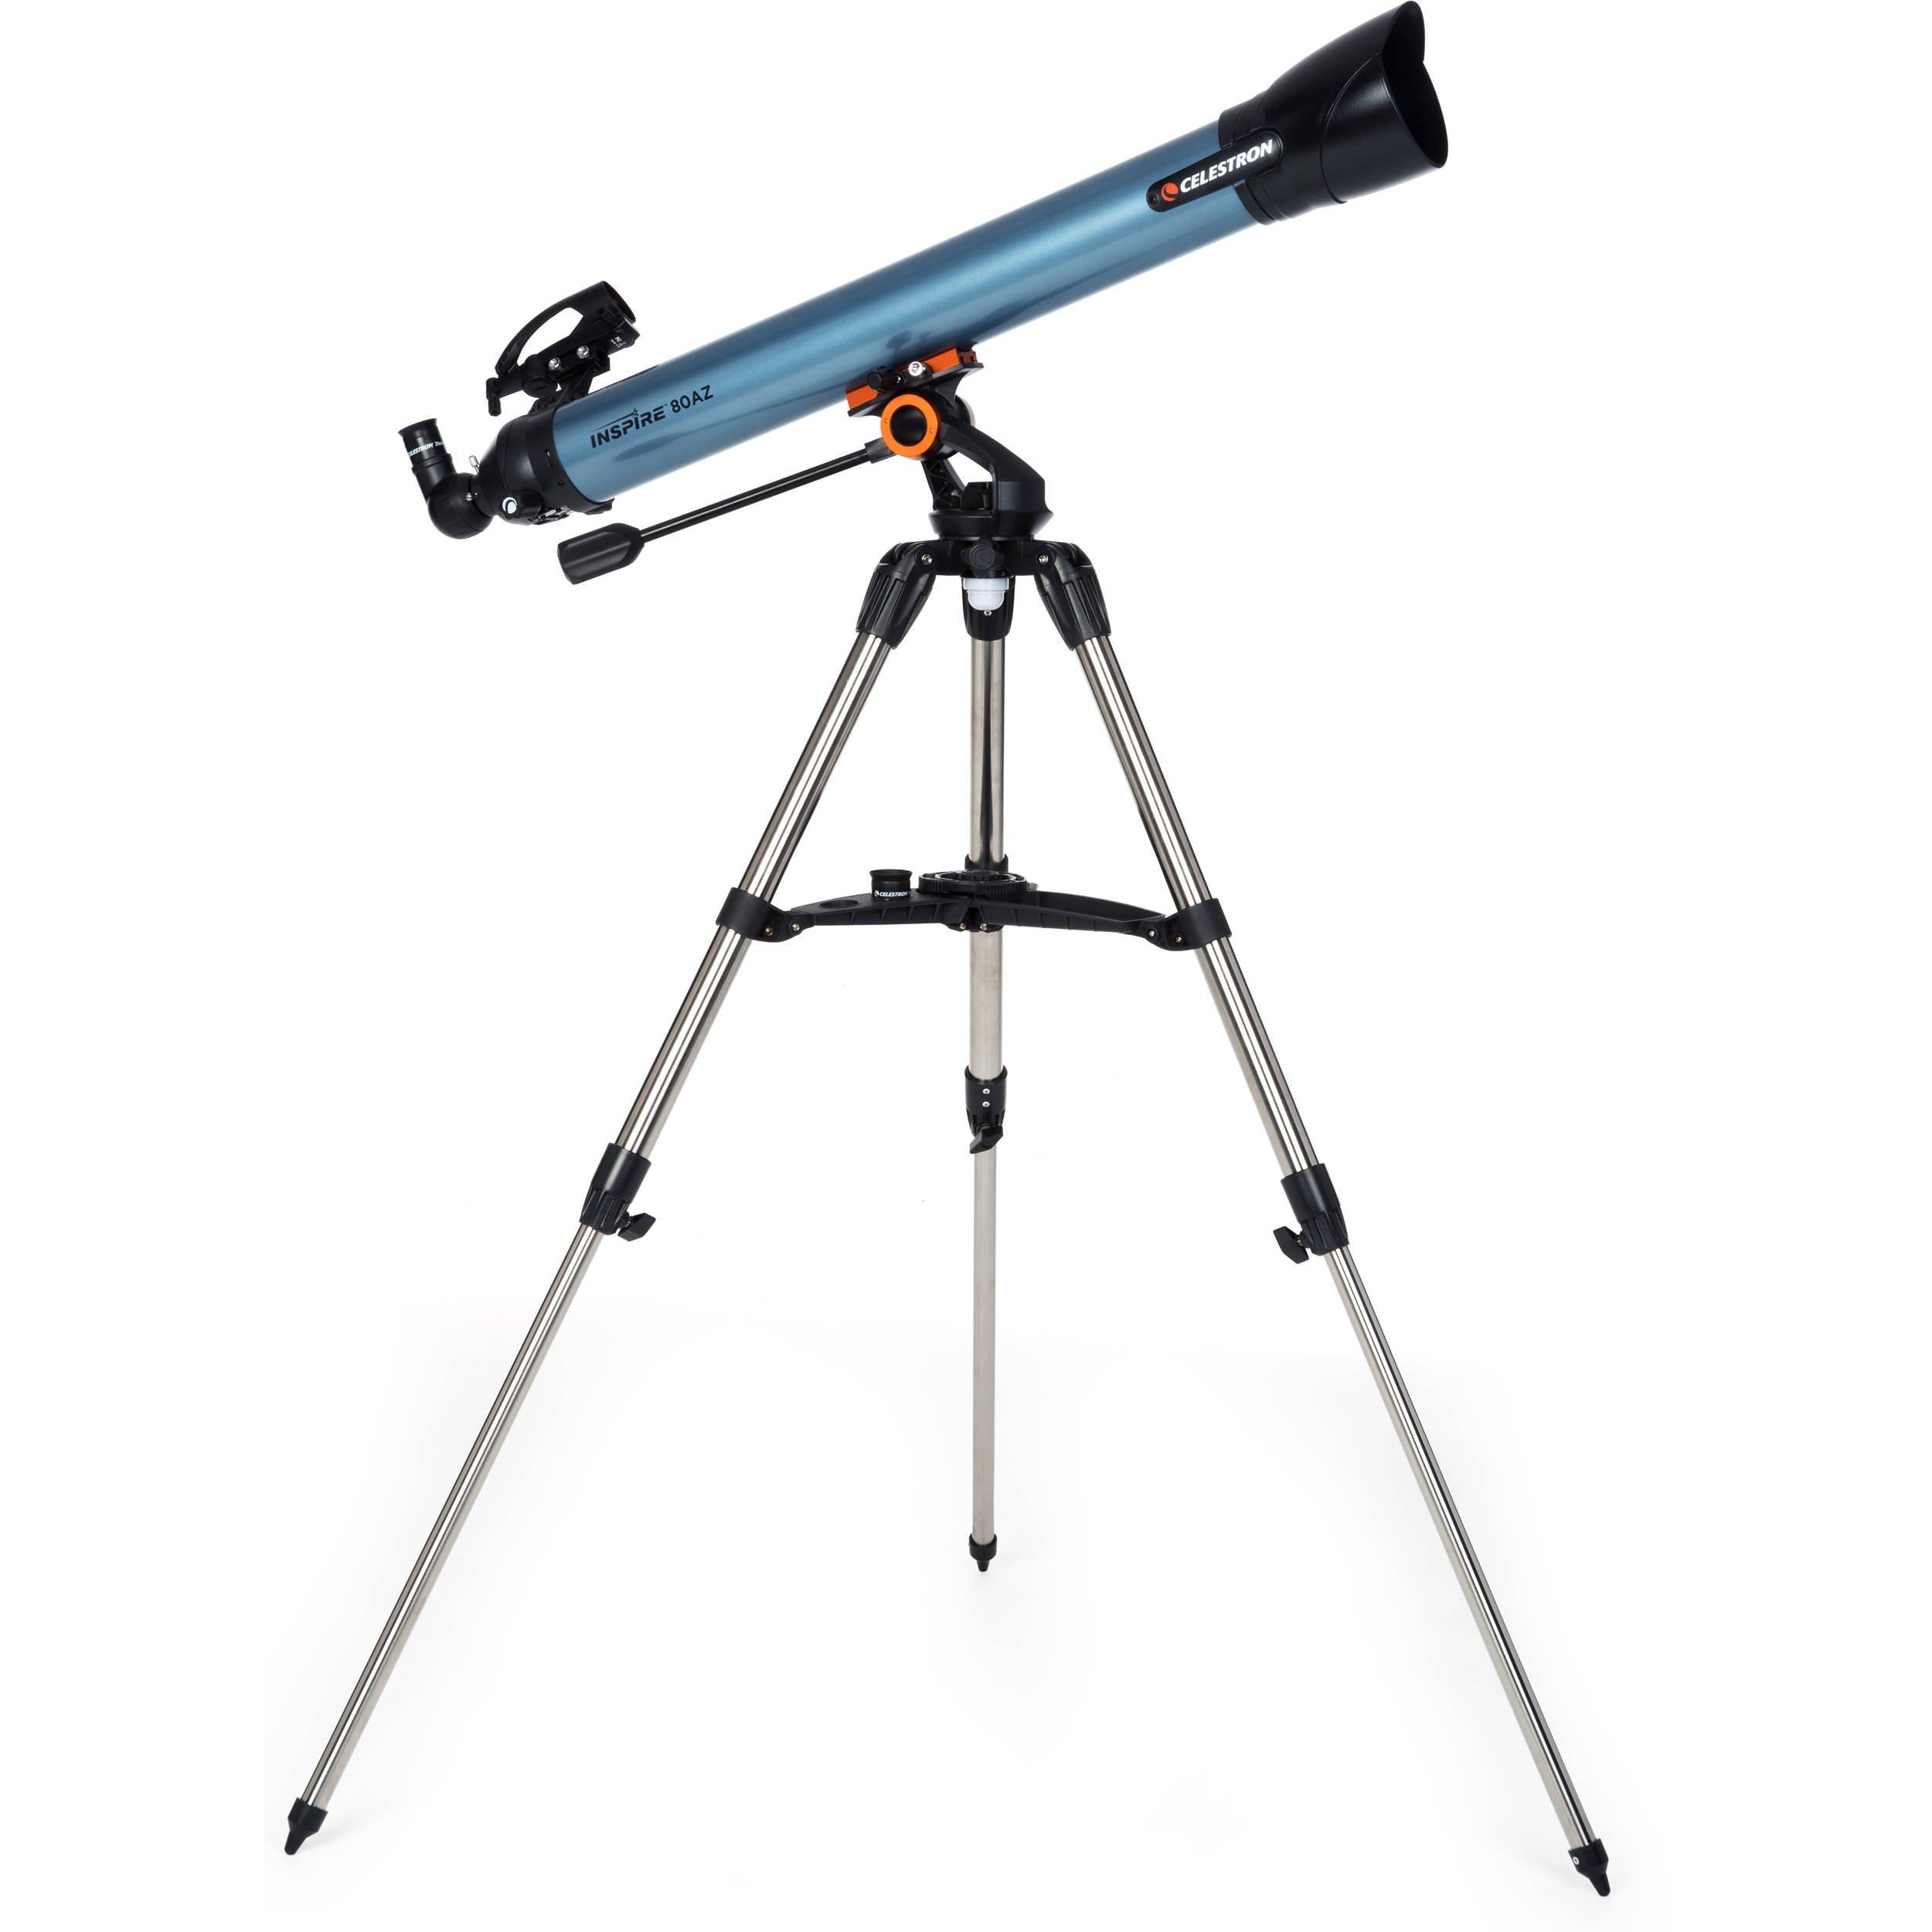 Celestron Inspire 80AZ Refractor Telescope Review Cover